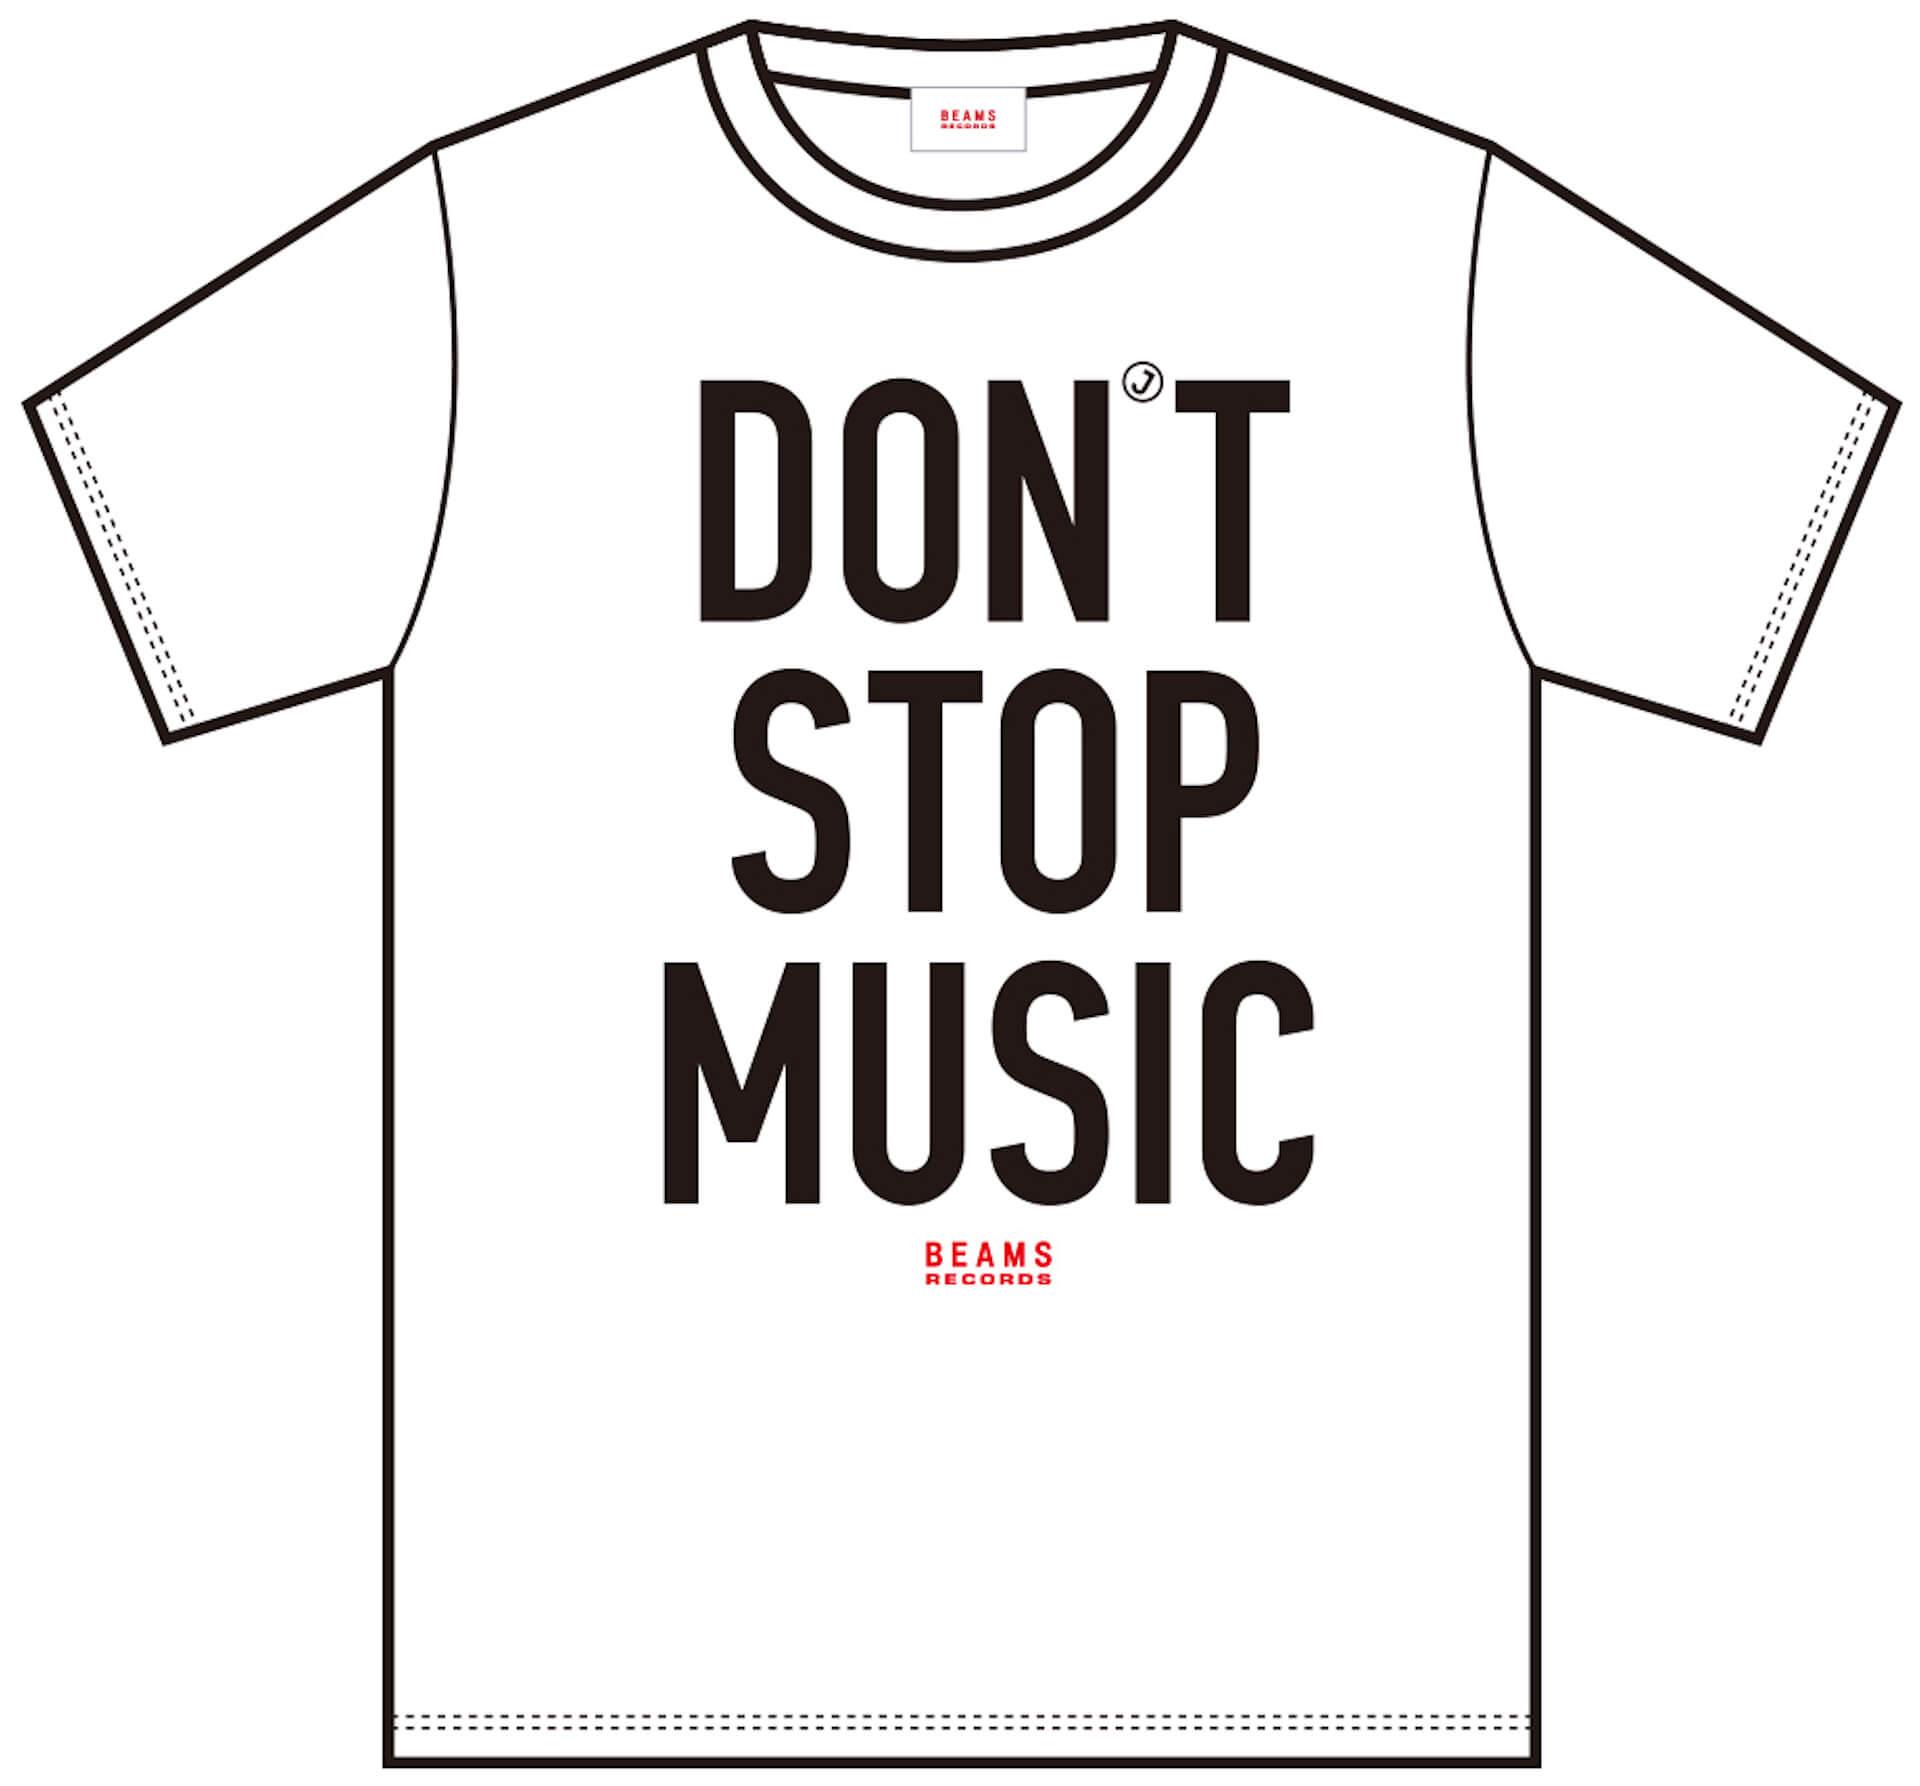 J-WAVE「#音楽を止めるな」BEAMS RECORDS協力のもと、ライブハウスを支援するオリジナルTシャツが受注販売開始! lf200515_jwave_beamsrecords_tshirts_01